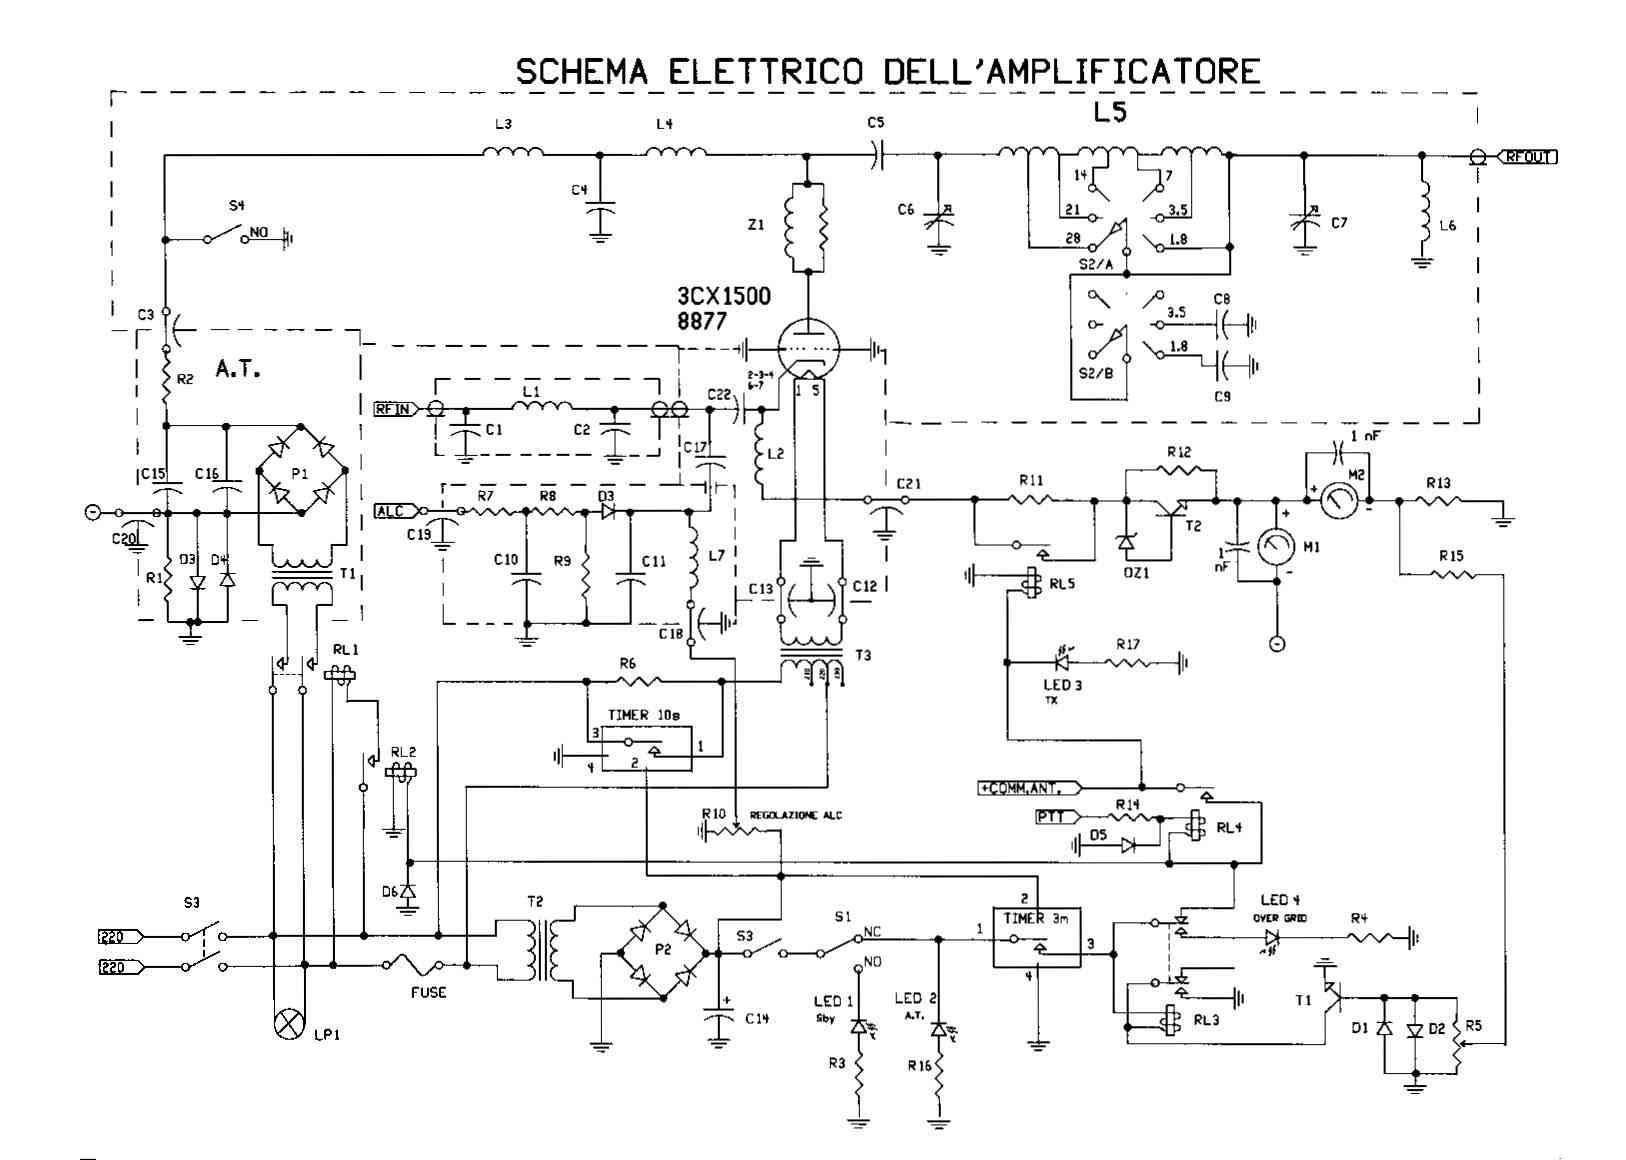 Schema Elettrico Per Wilayah : Schema elettrico per dimmer